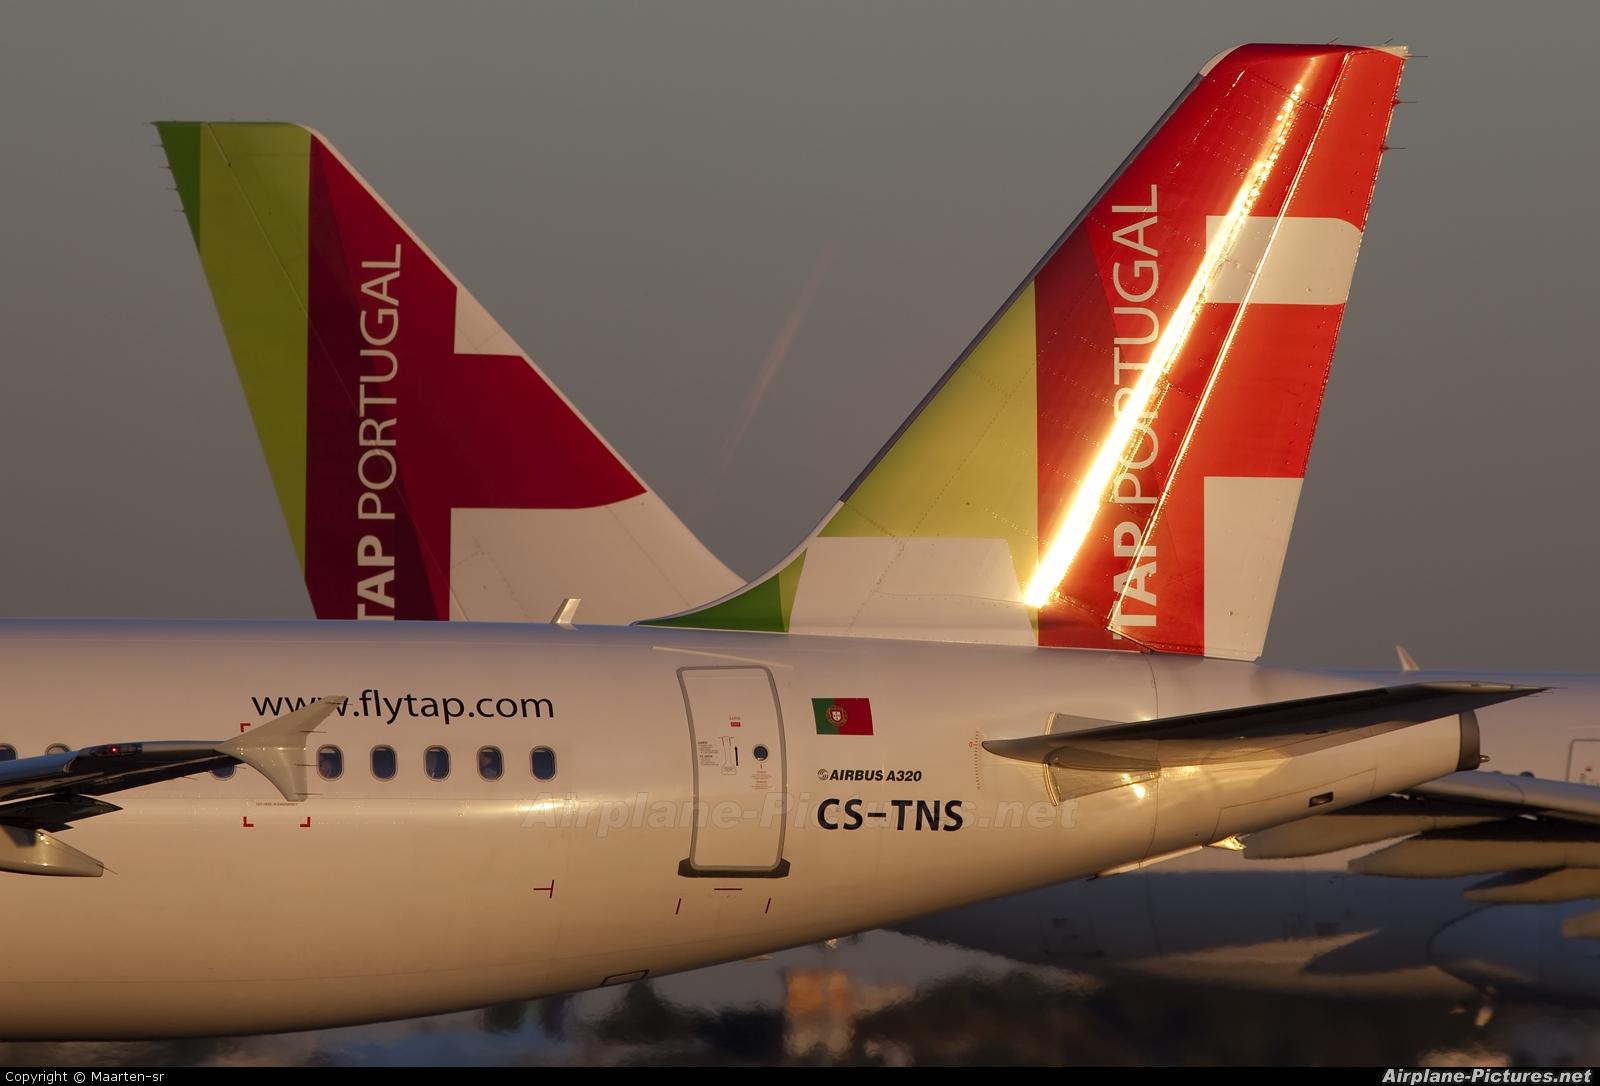 TAP Portugal CS-TNS aircraft at Lisbon